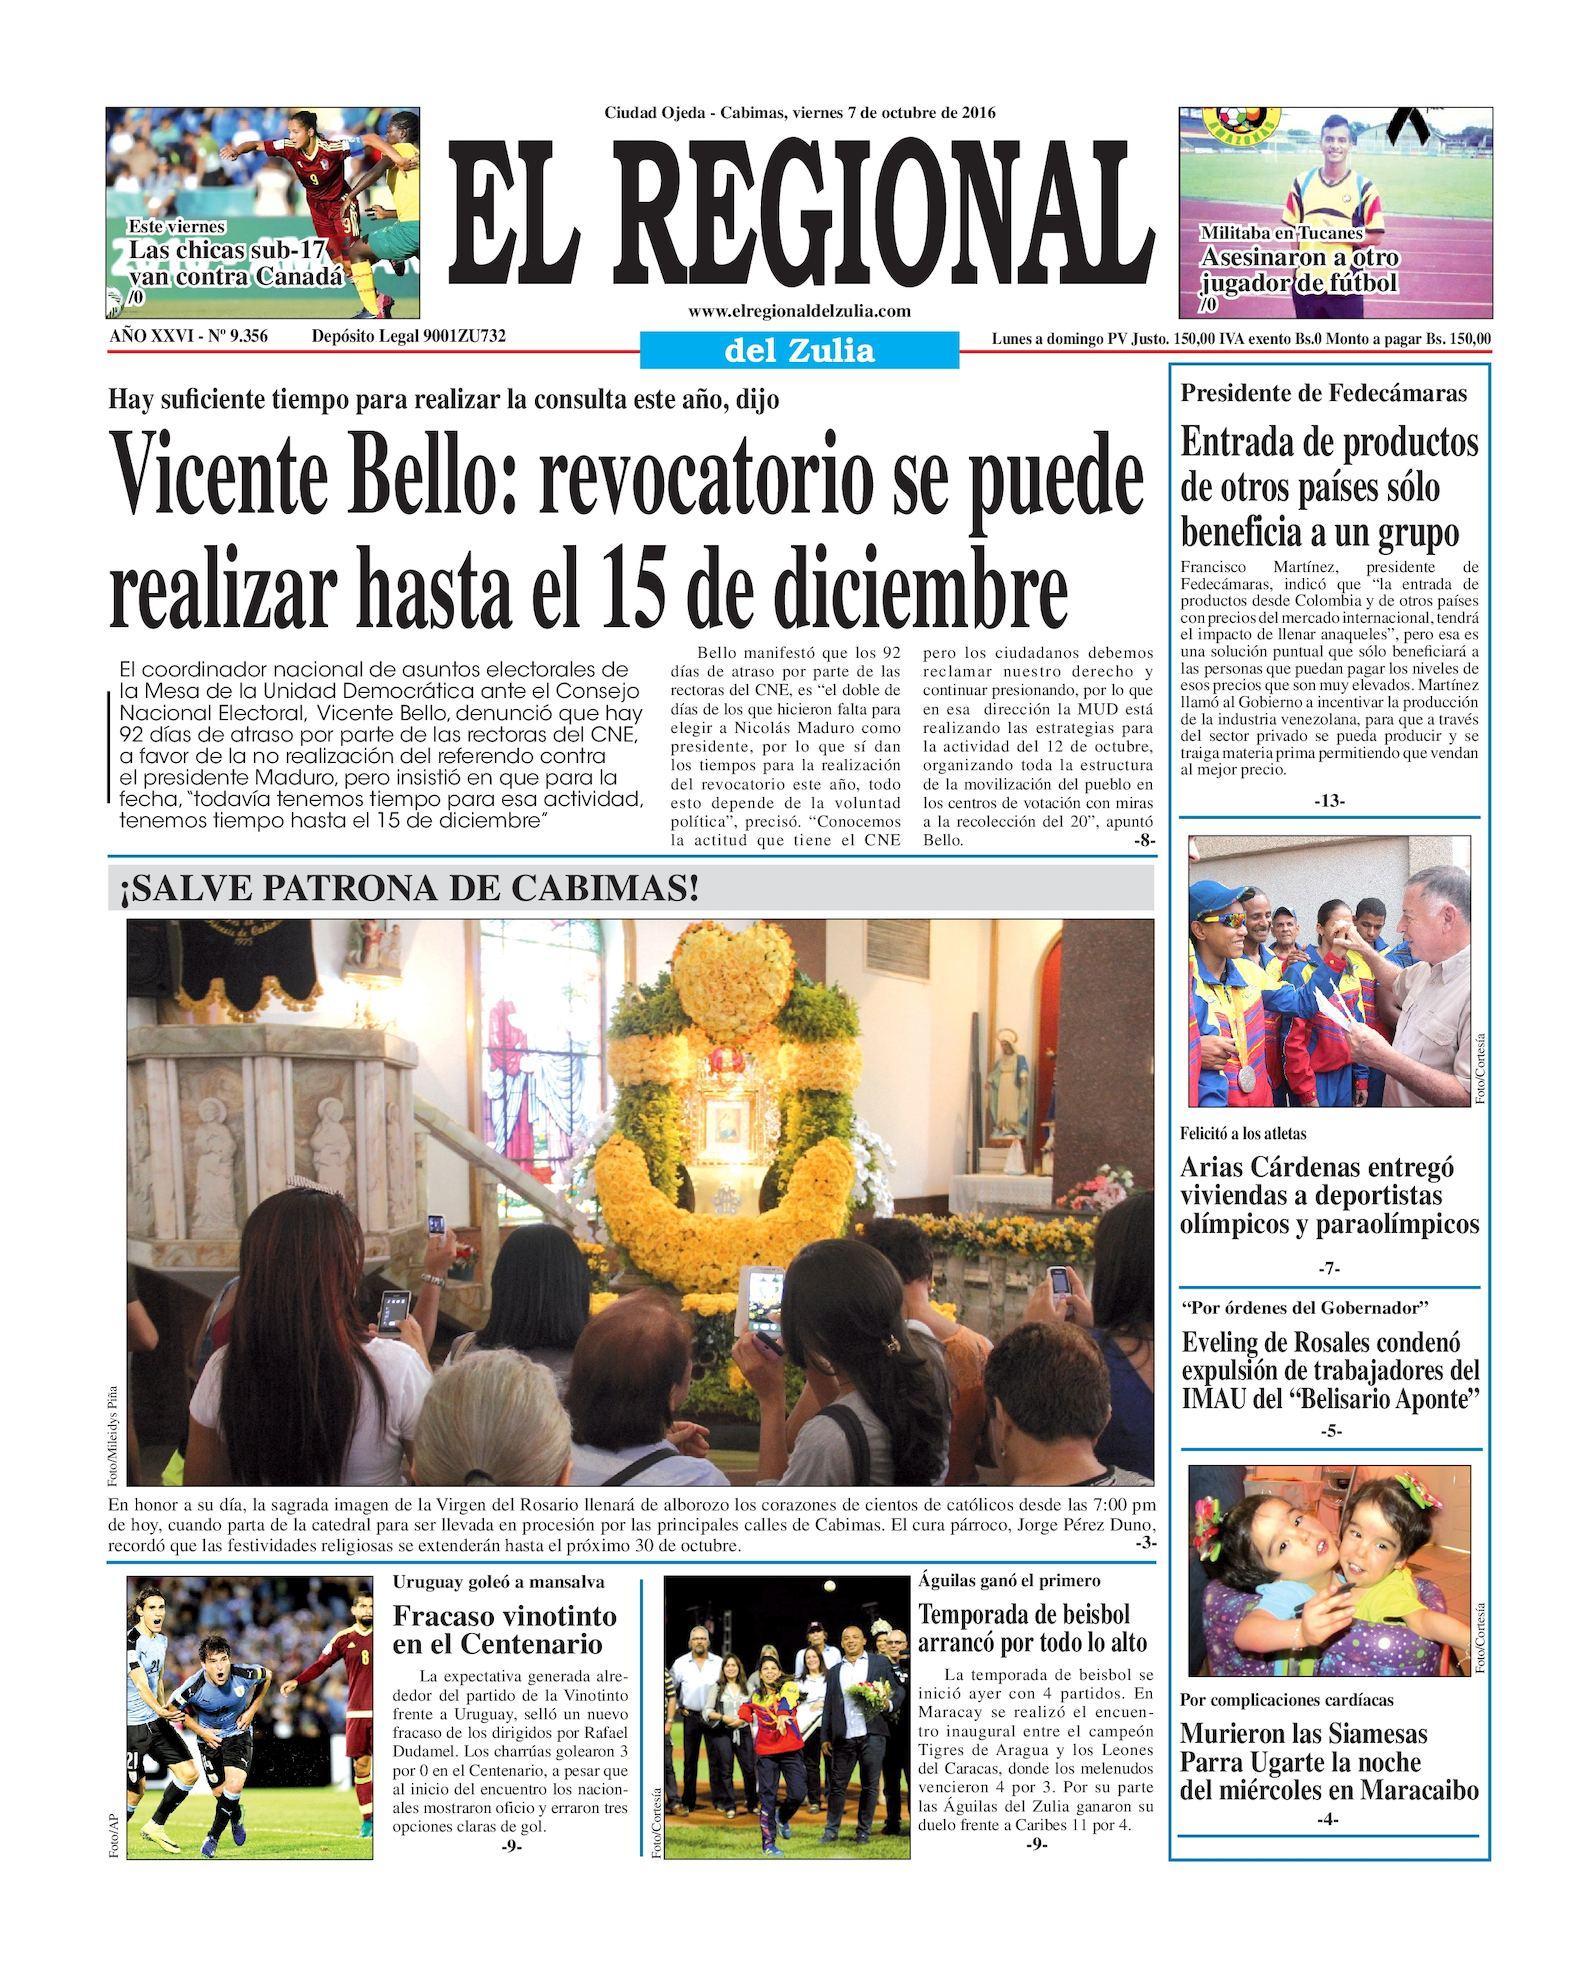 Calaméo - El Regional del Zulia 07-10-2016